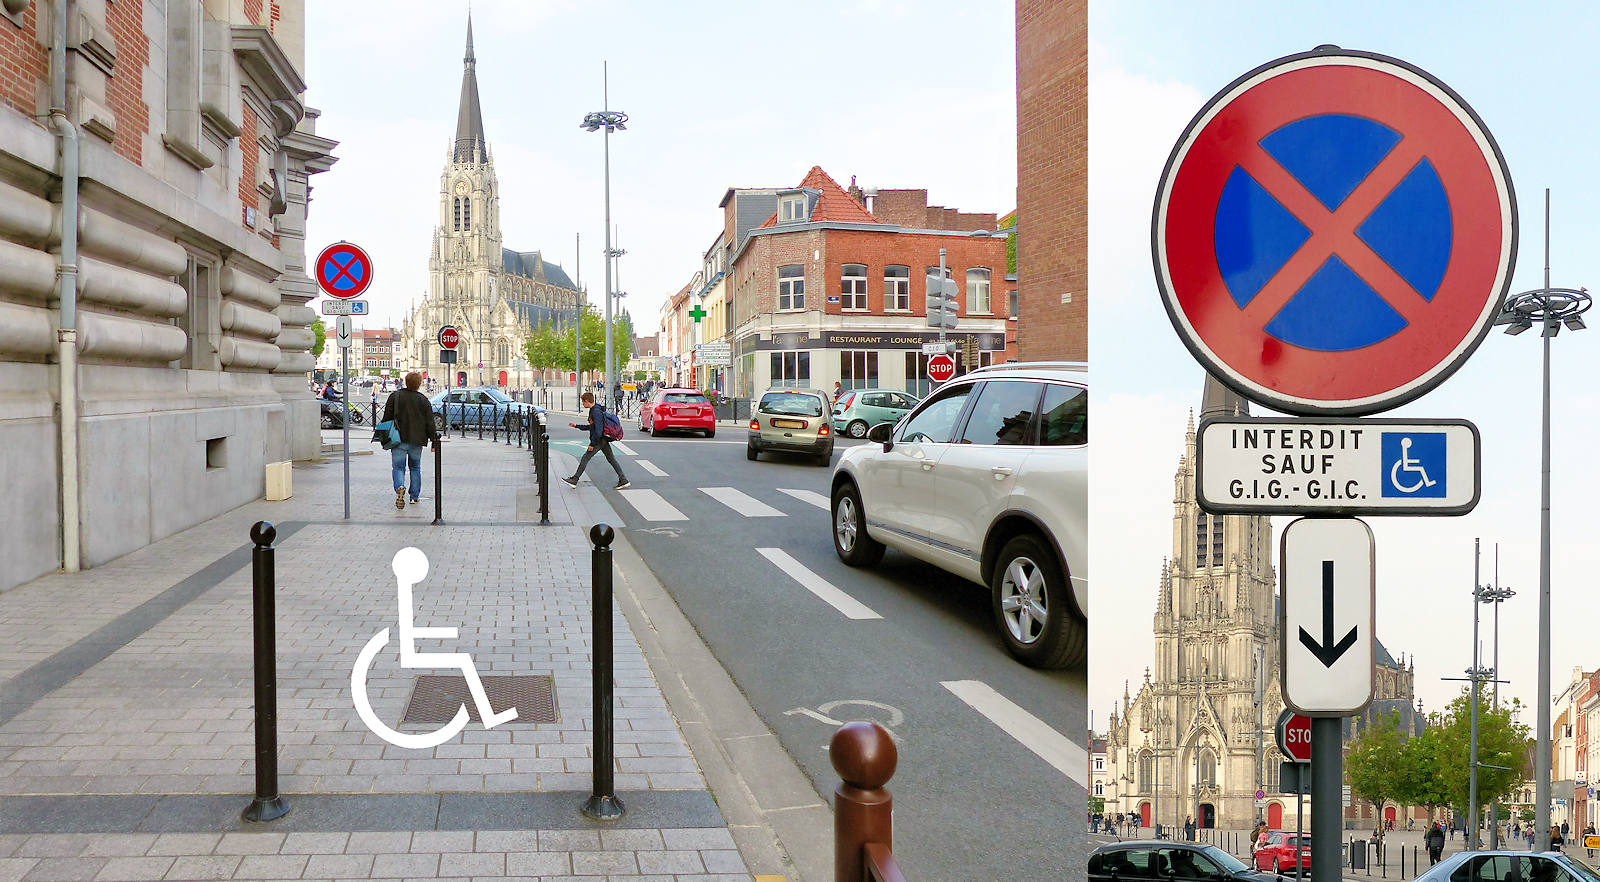 Stationnement G.I.G. G.I.C. - Tourcoing, rue des Anges